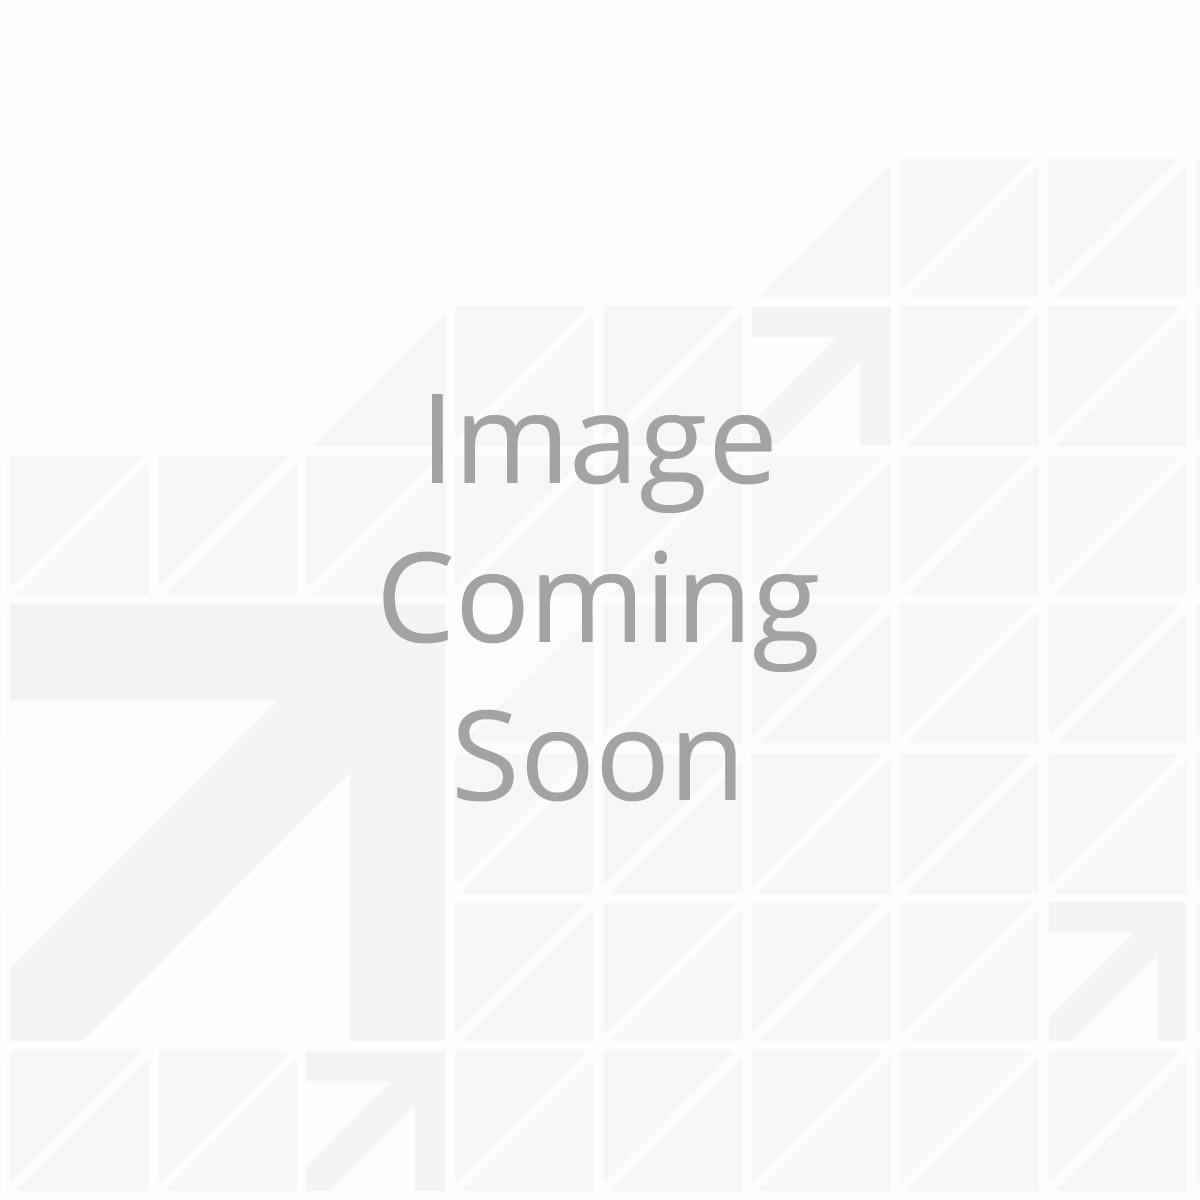 156740_-_pinbox_tank_valve_-_001